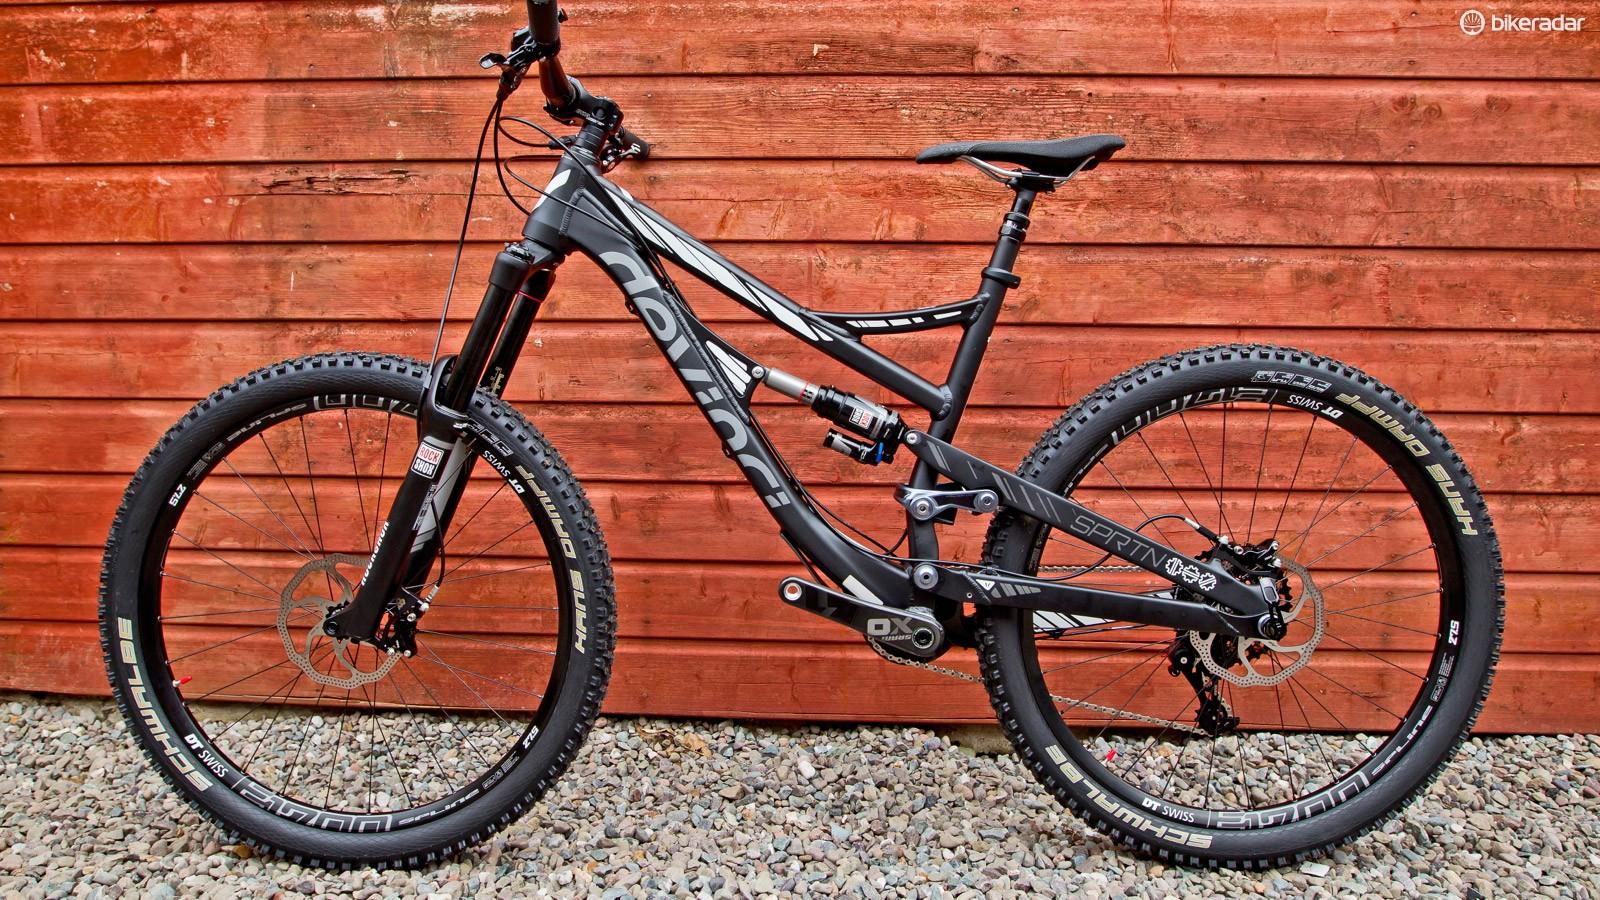 The Spartan is Devinci's new enduro race bike